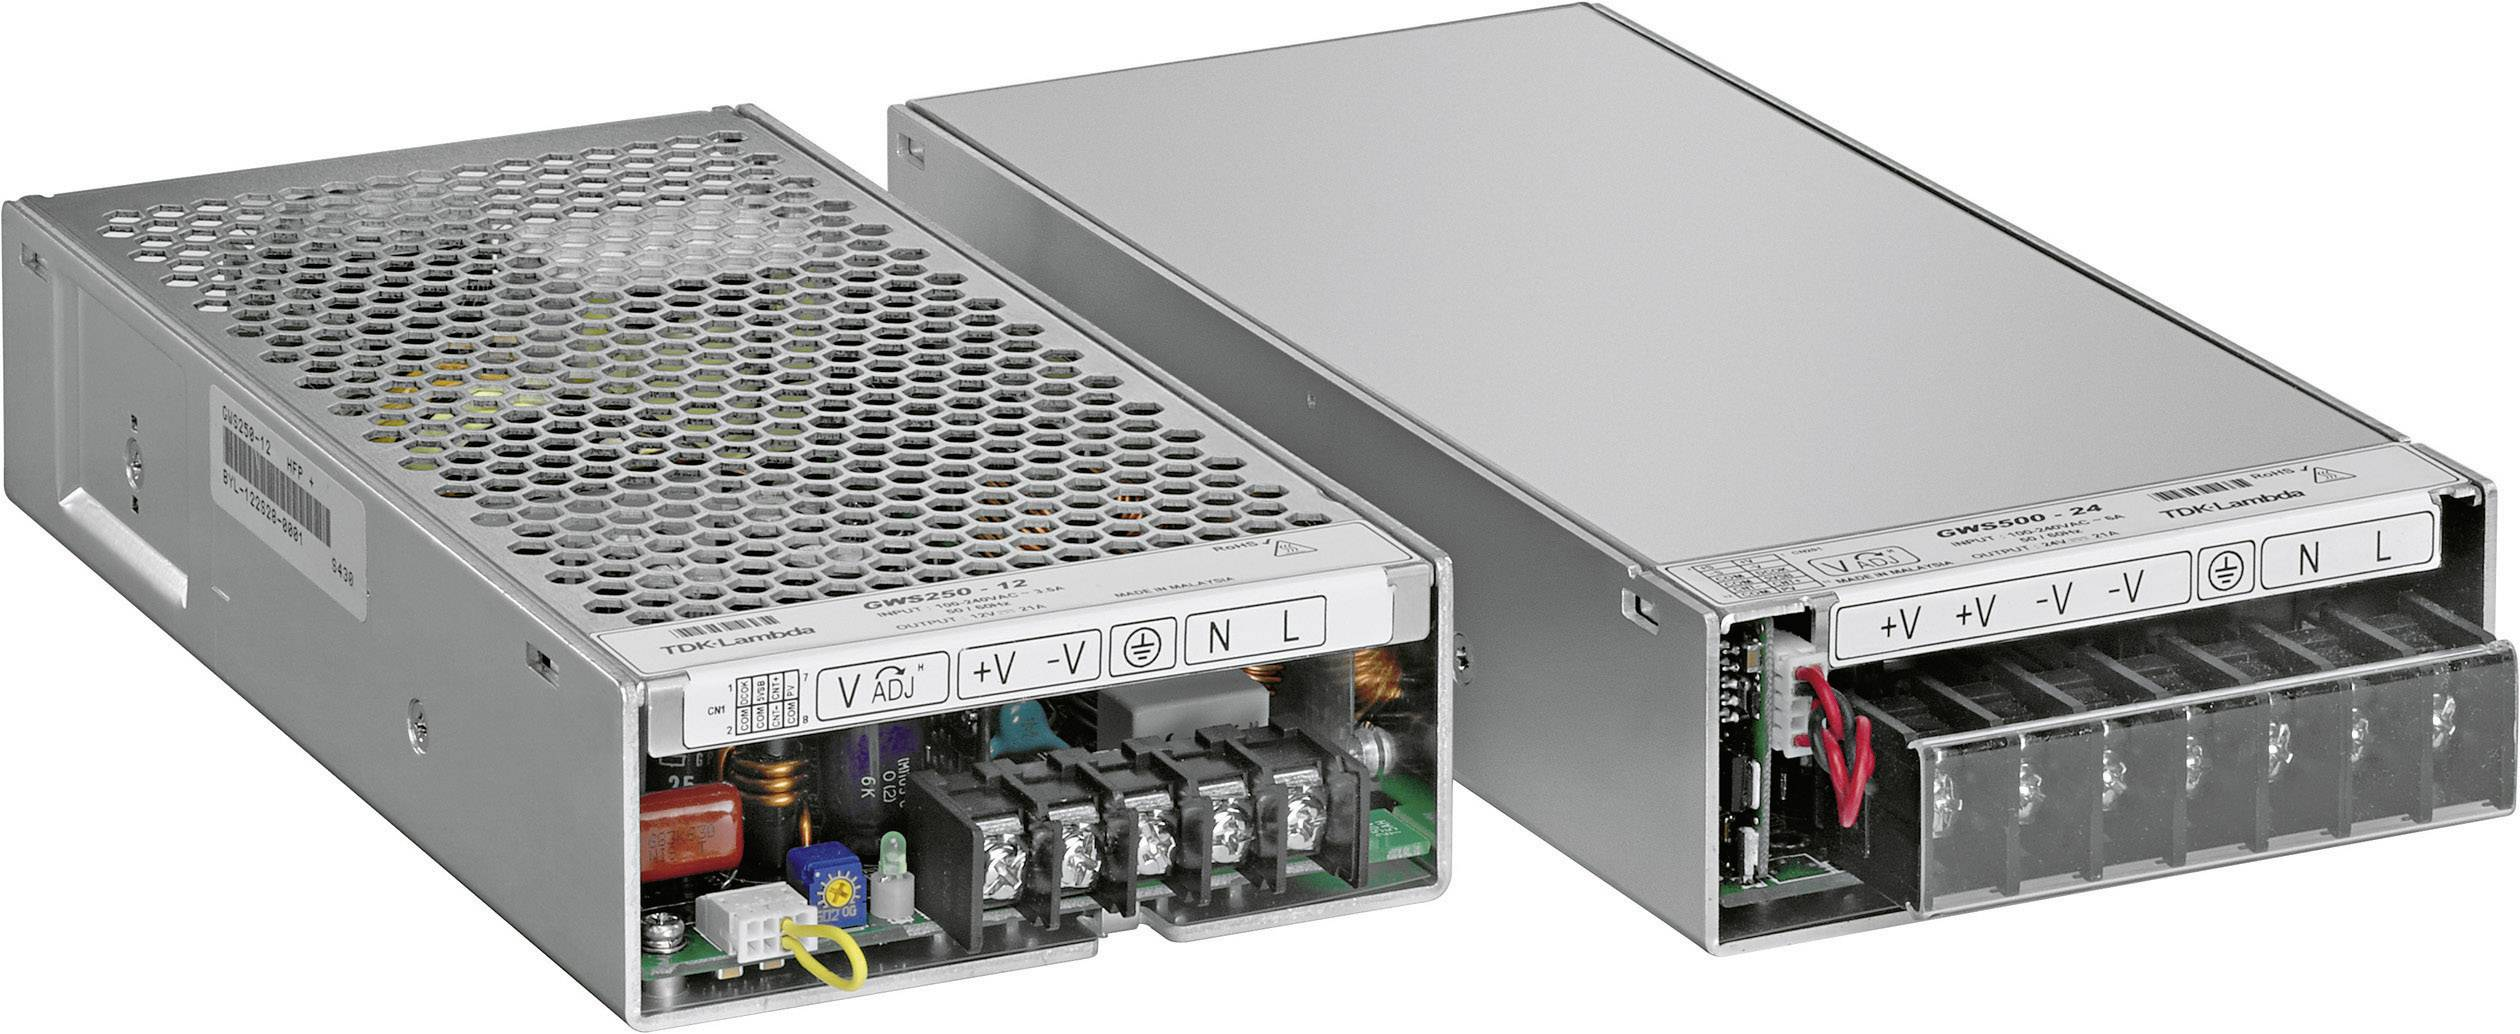 Zabudovateľný zdroj AC/DC TDK-Lambda GWS-250-24, 28.8 V/DC, 10.5 A, 250 W